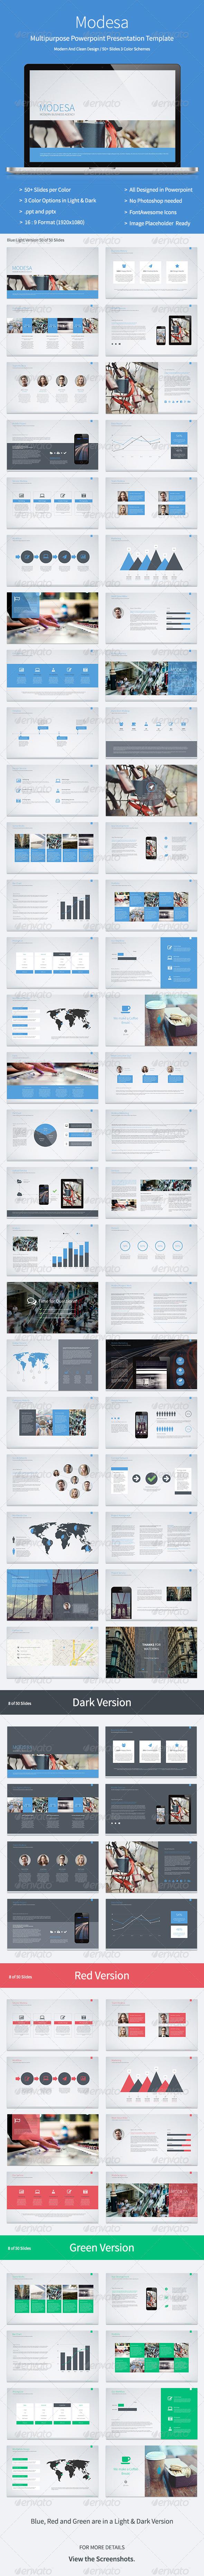 GraphicRiver Modesa Powerpoint Multipurpose Template 8296694